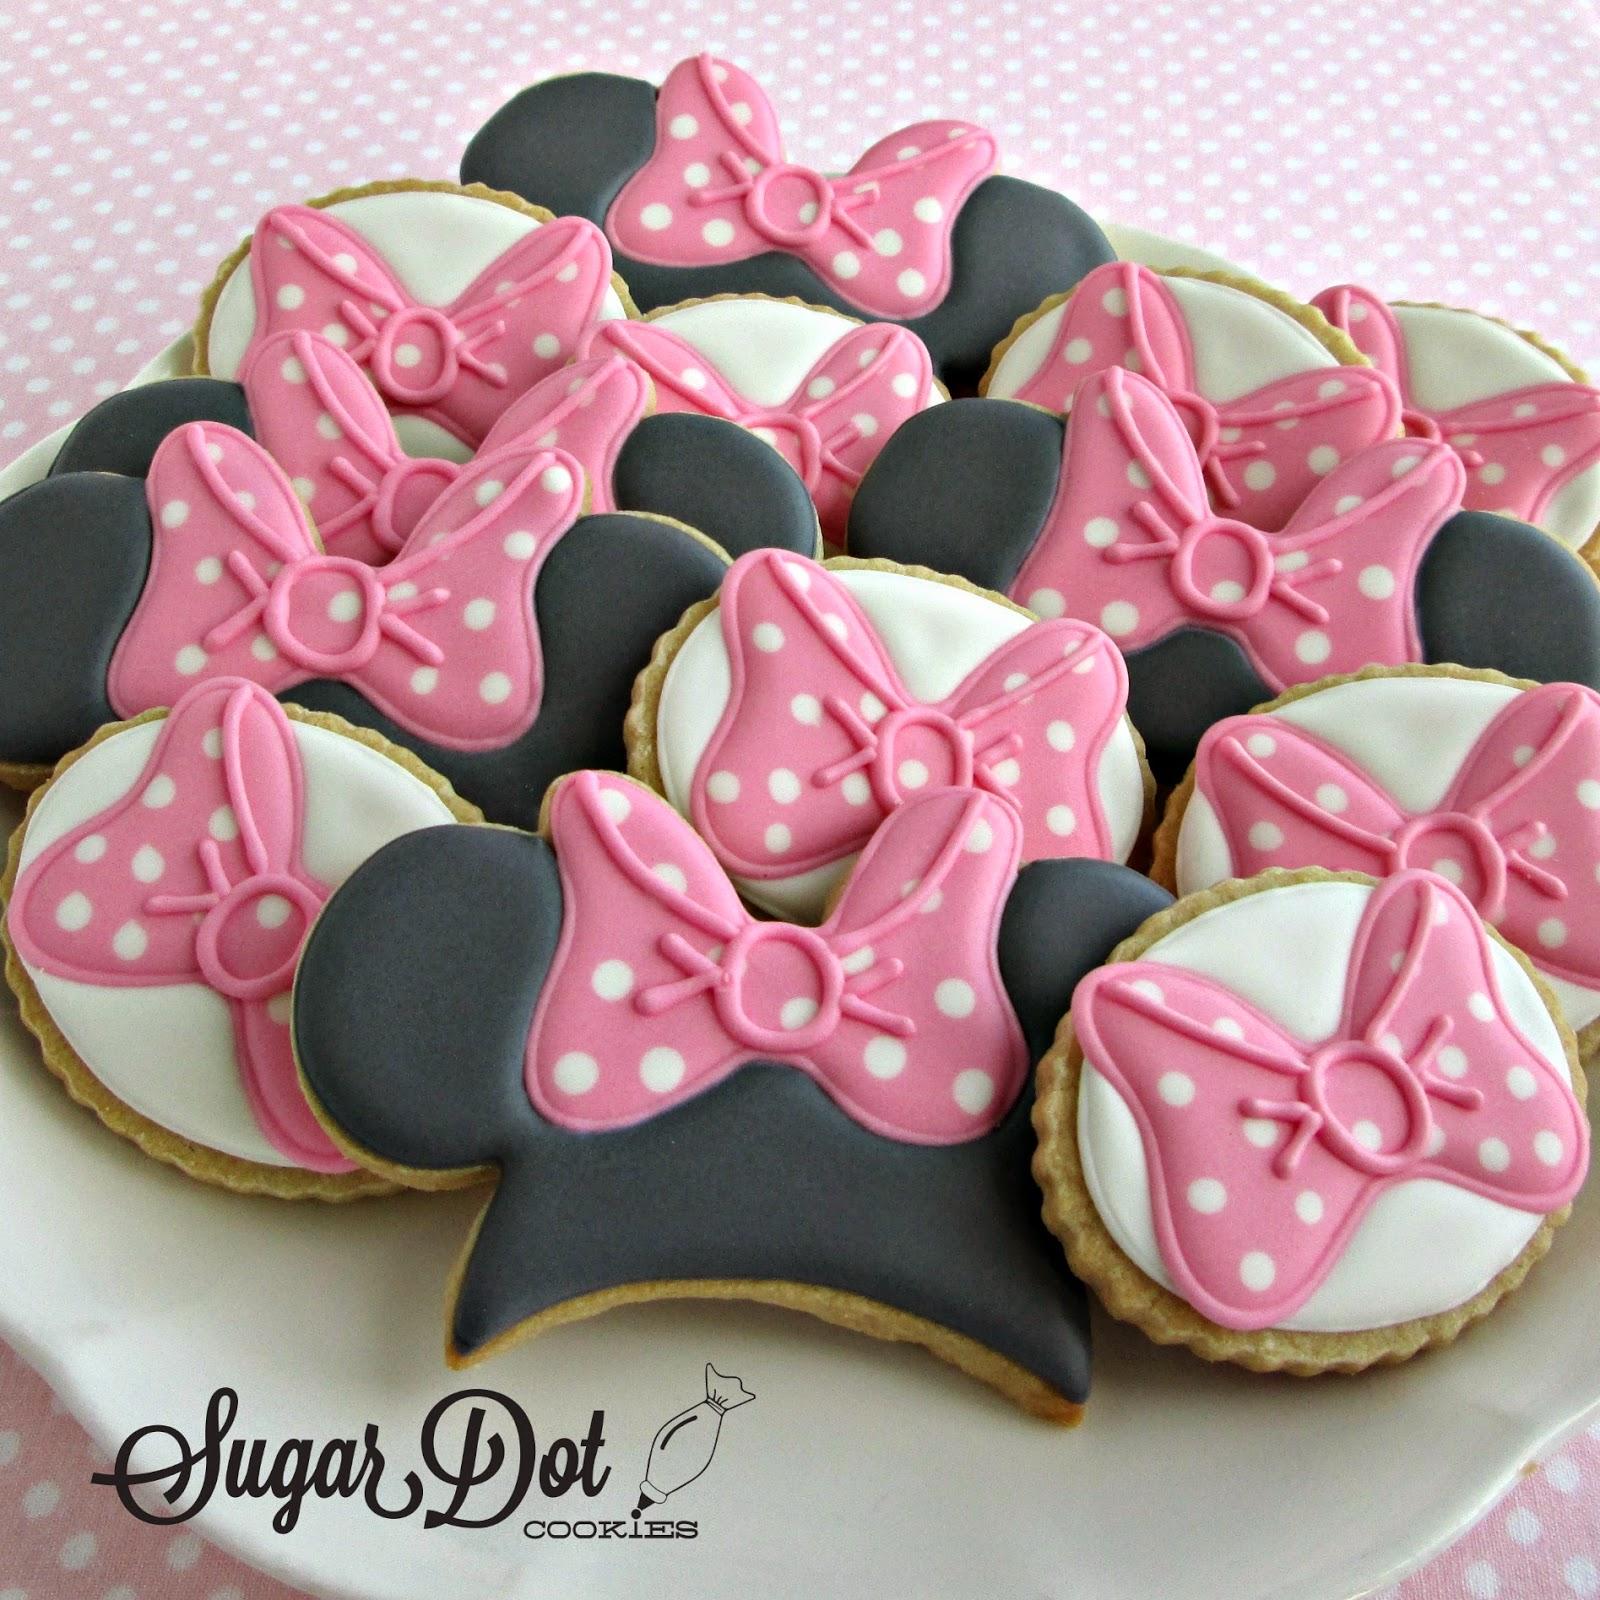 Sugar Dot Cookies: 2014